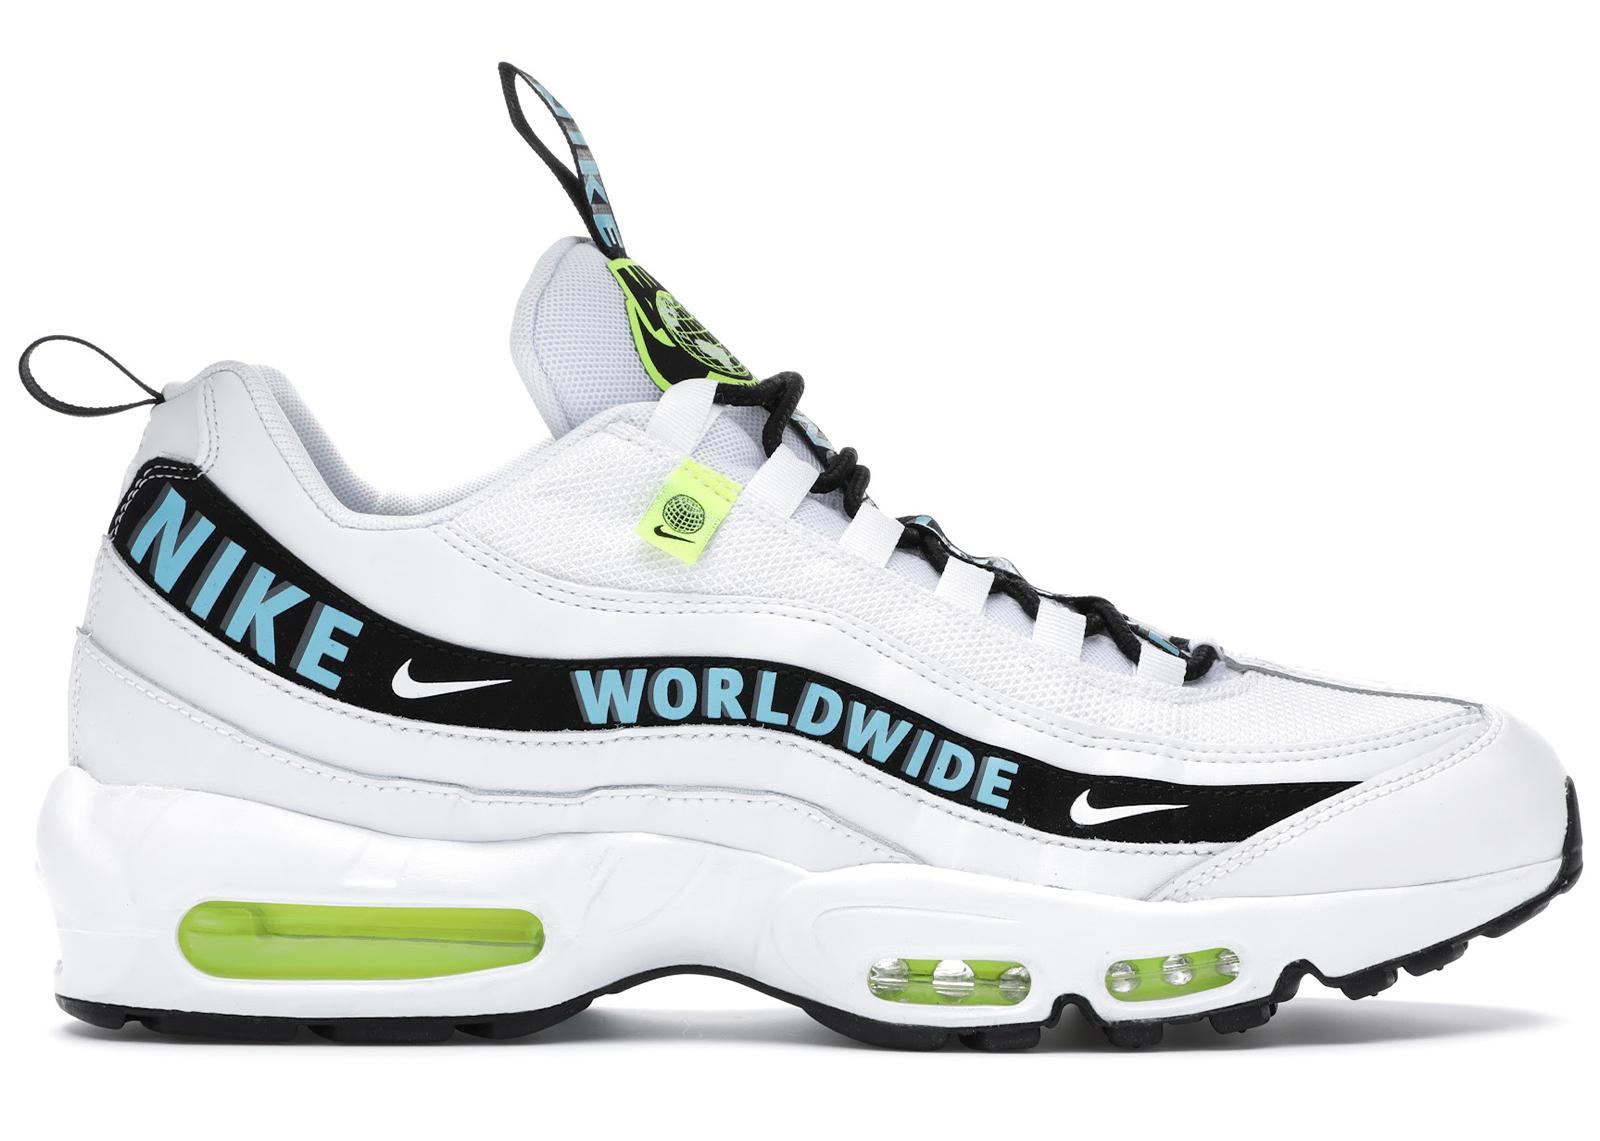 Nike Air Max 95 Worldwide Pack White